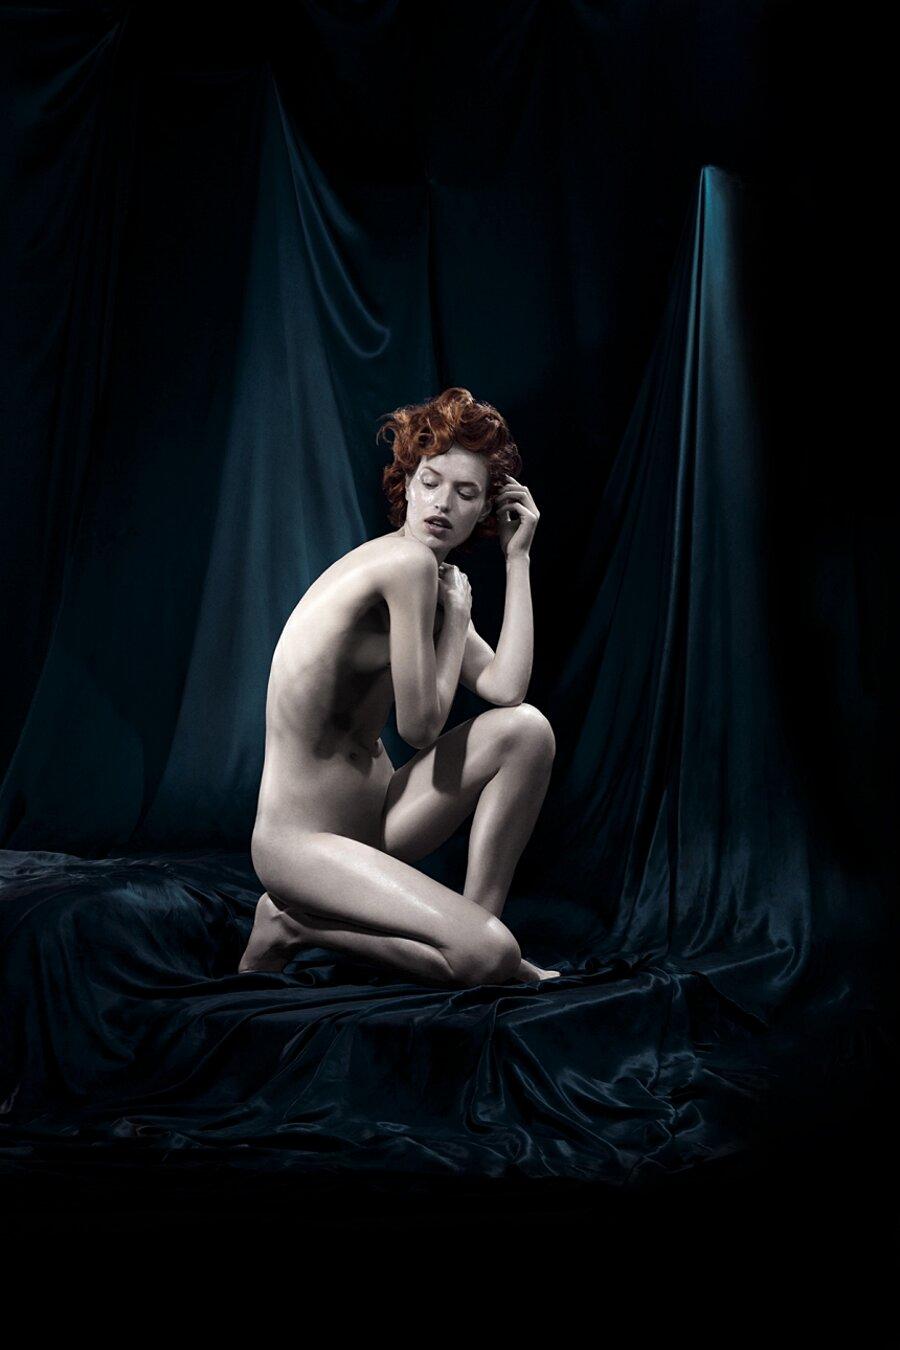 red-hot-campagna-foto-persone-capelli-rossi-thomas-knights-20